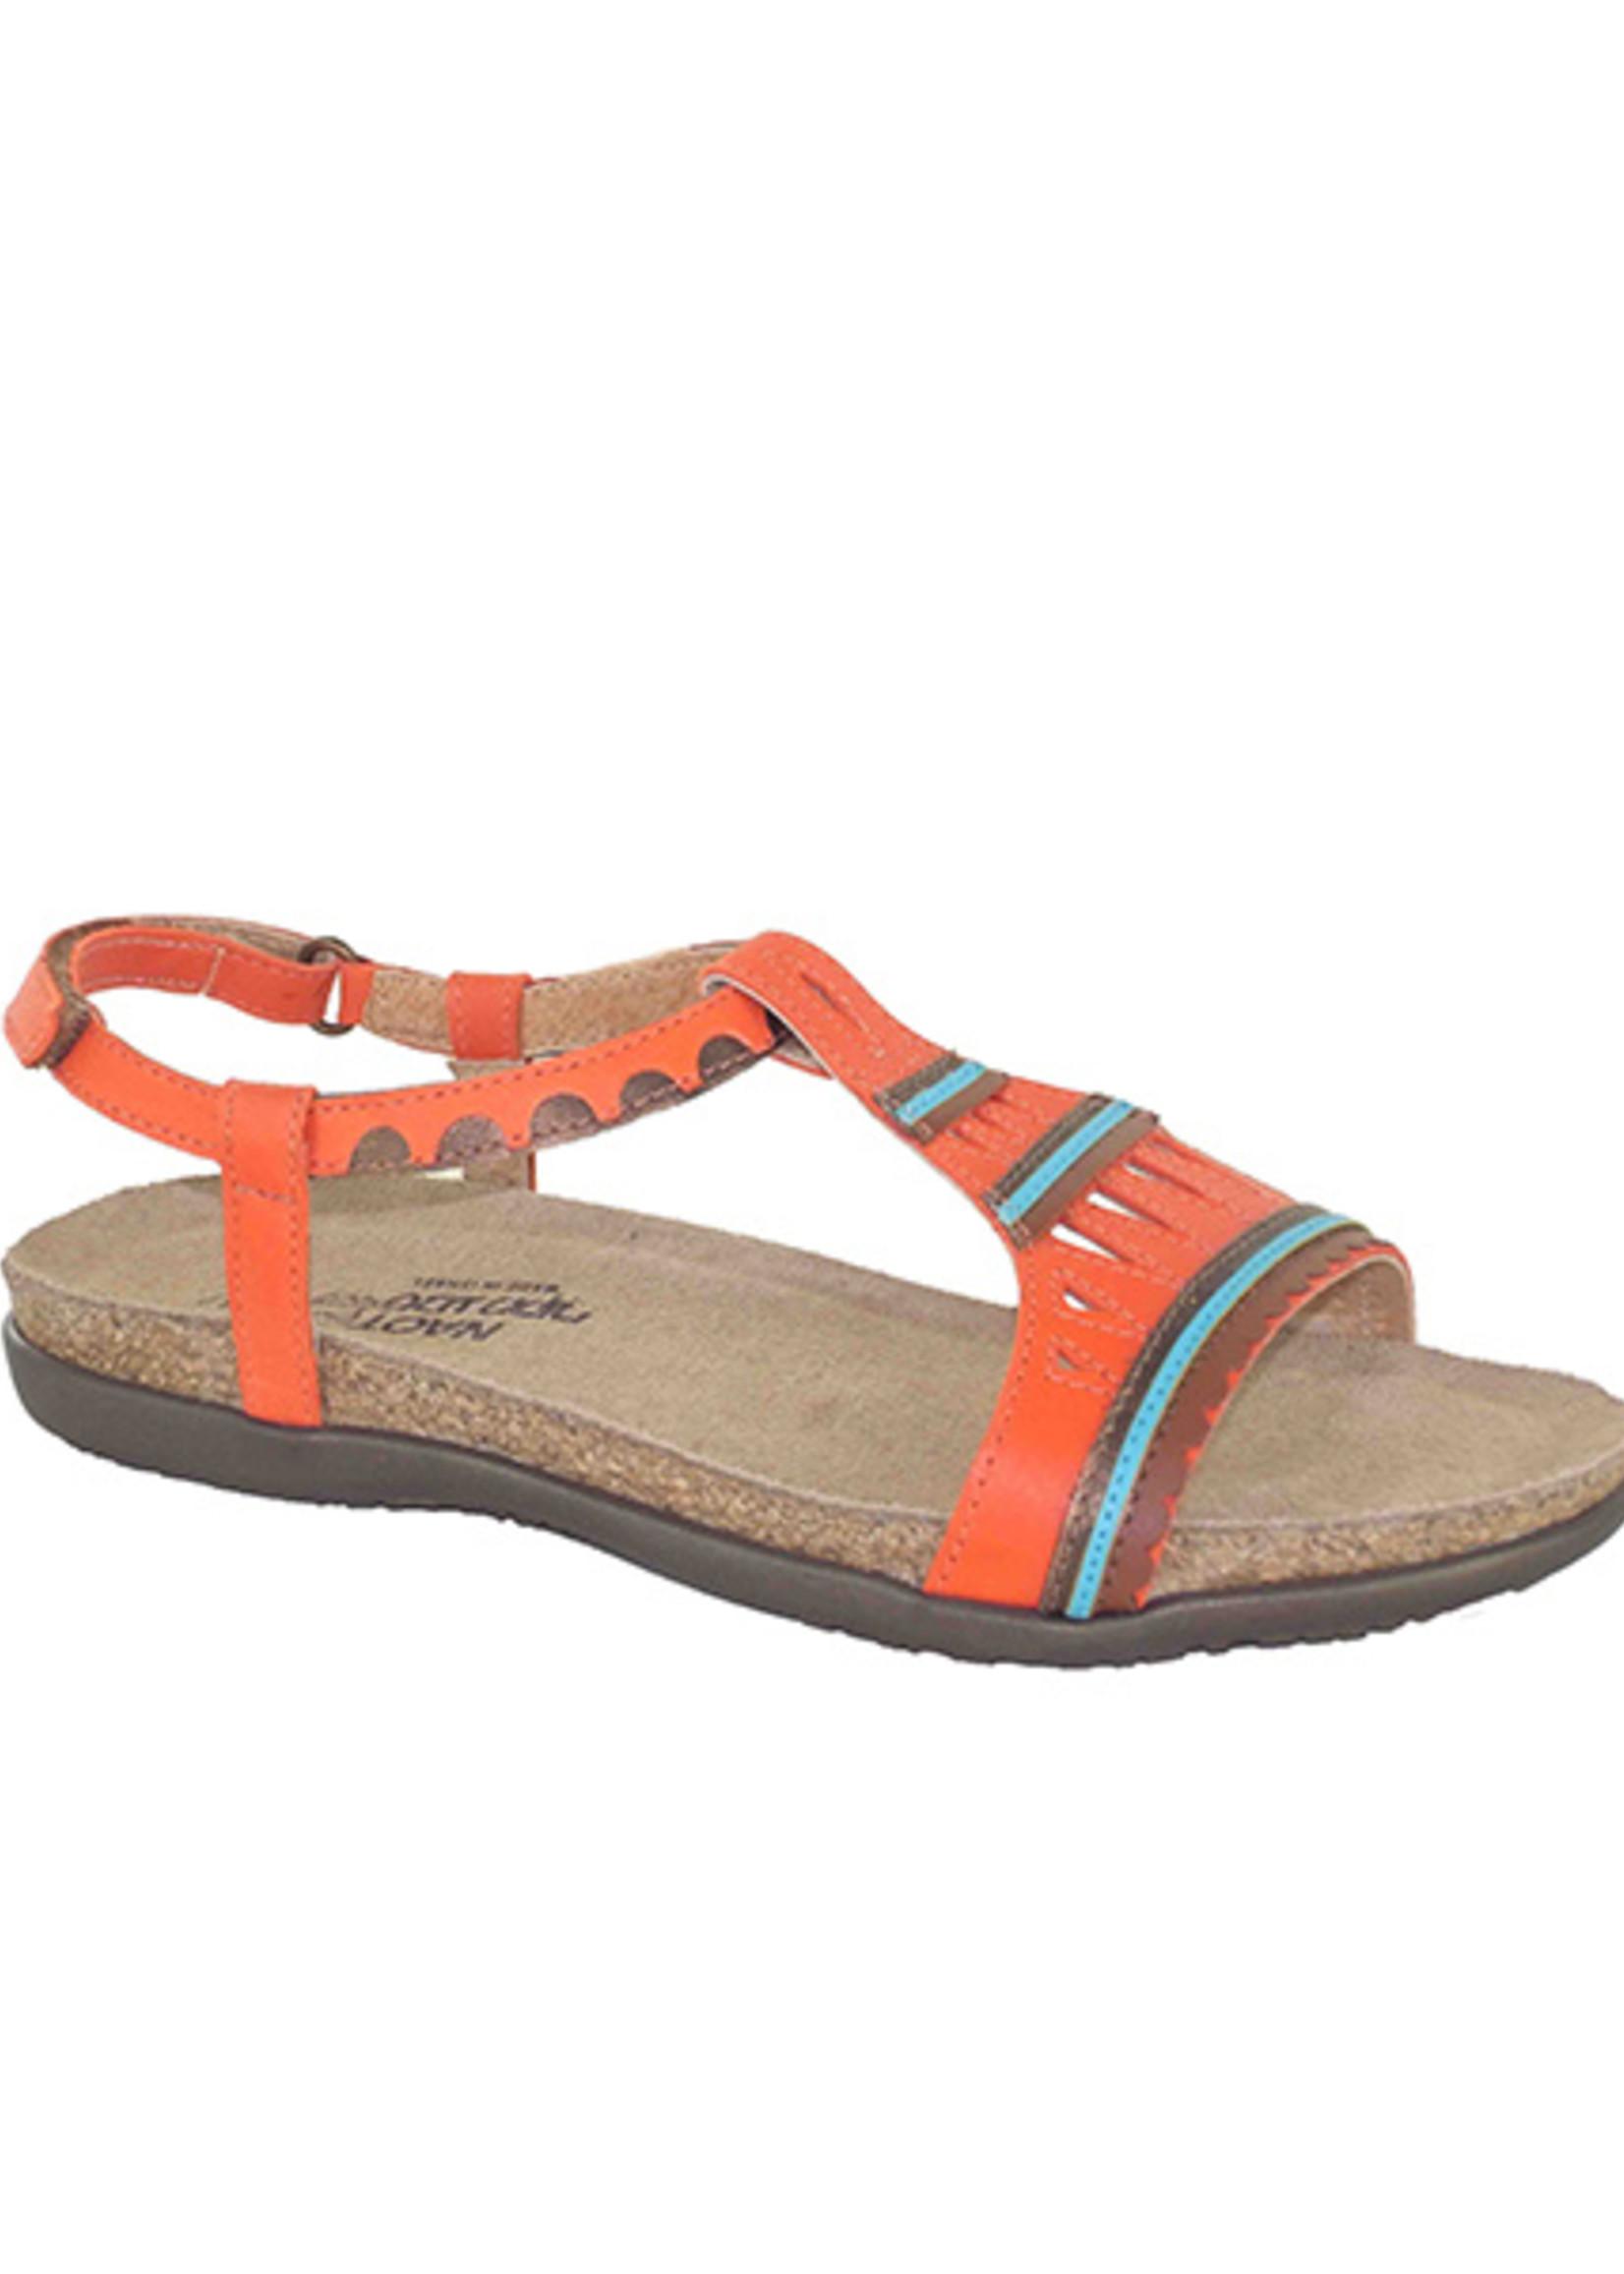 Naot Footwear Odelia in Orange Combo